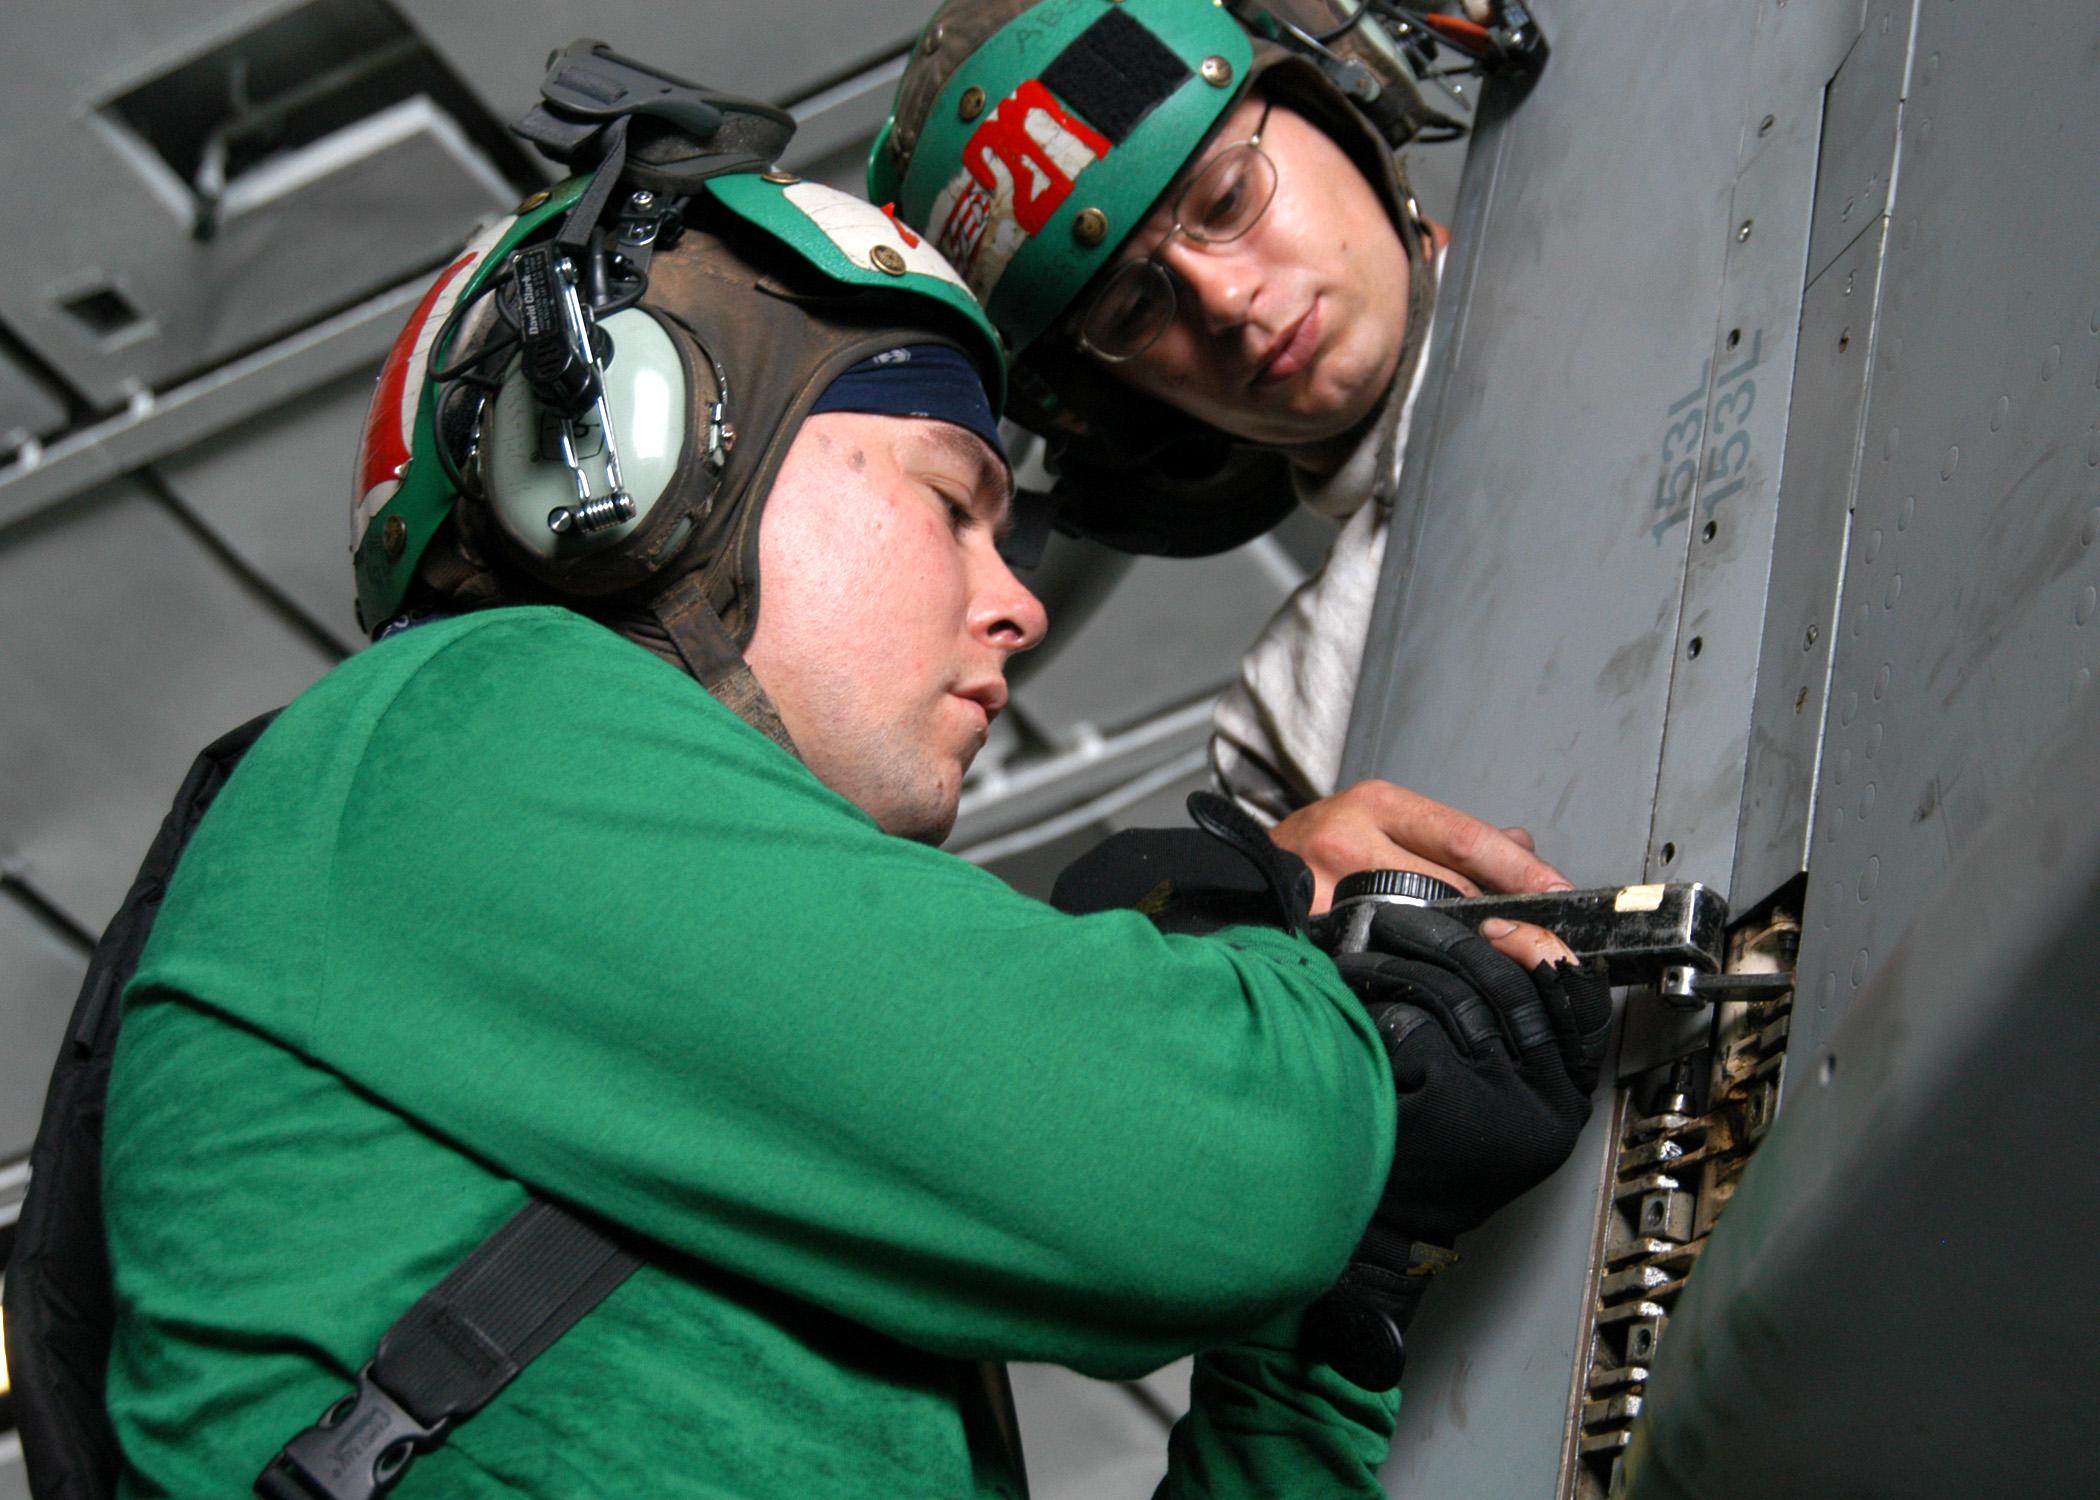 fileus navy 040612 n 7695r 001 aviation machinist mate 2nd class